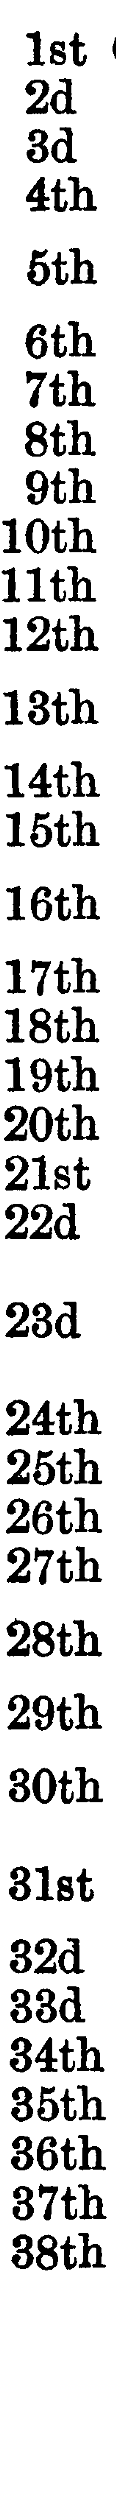 [ocr errors][ocr errors][ocr errors][ocr errors][merged small][ocr errors][ocr errors][ocr errors][ocr errors][ocr errors][ocr errors][ocr errors]